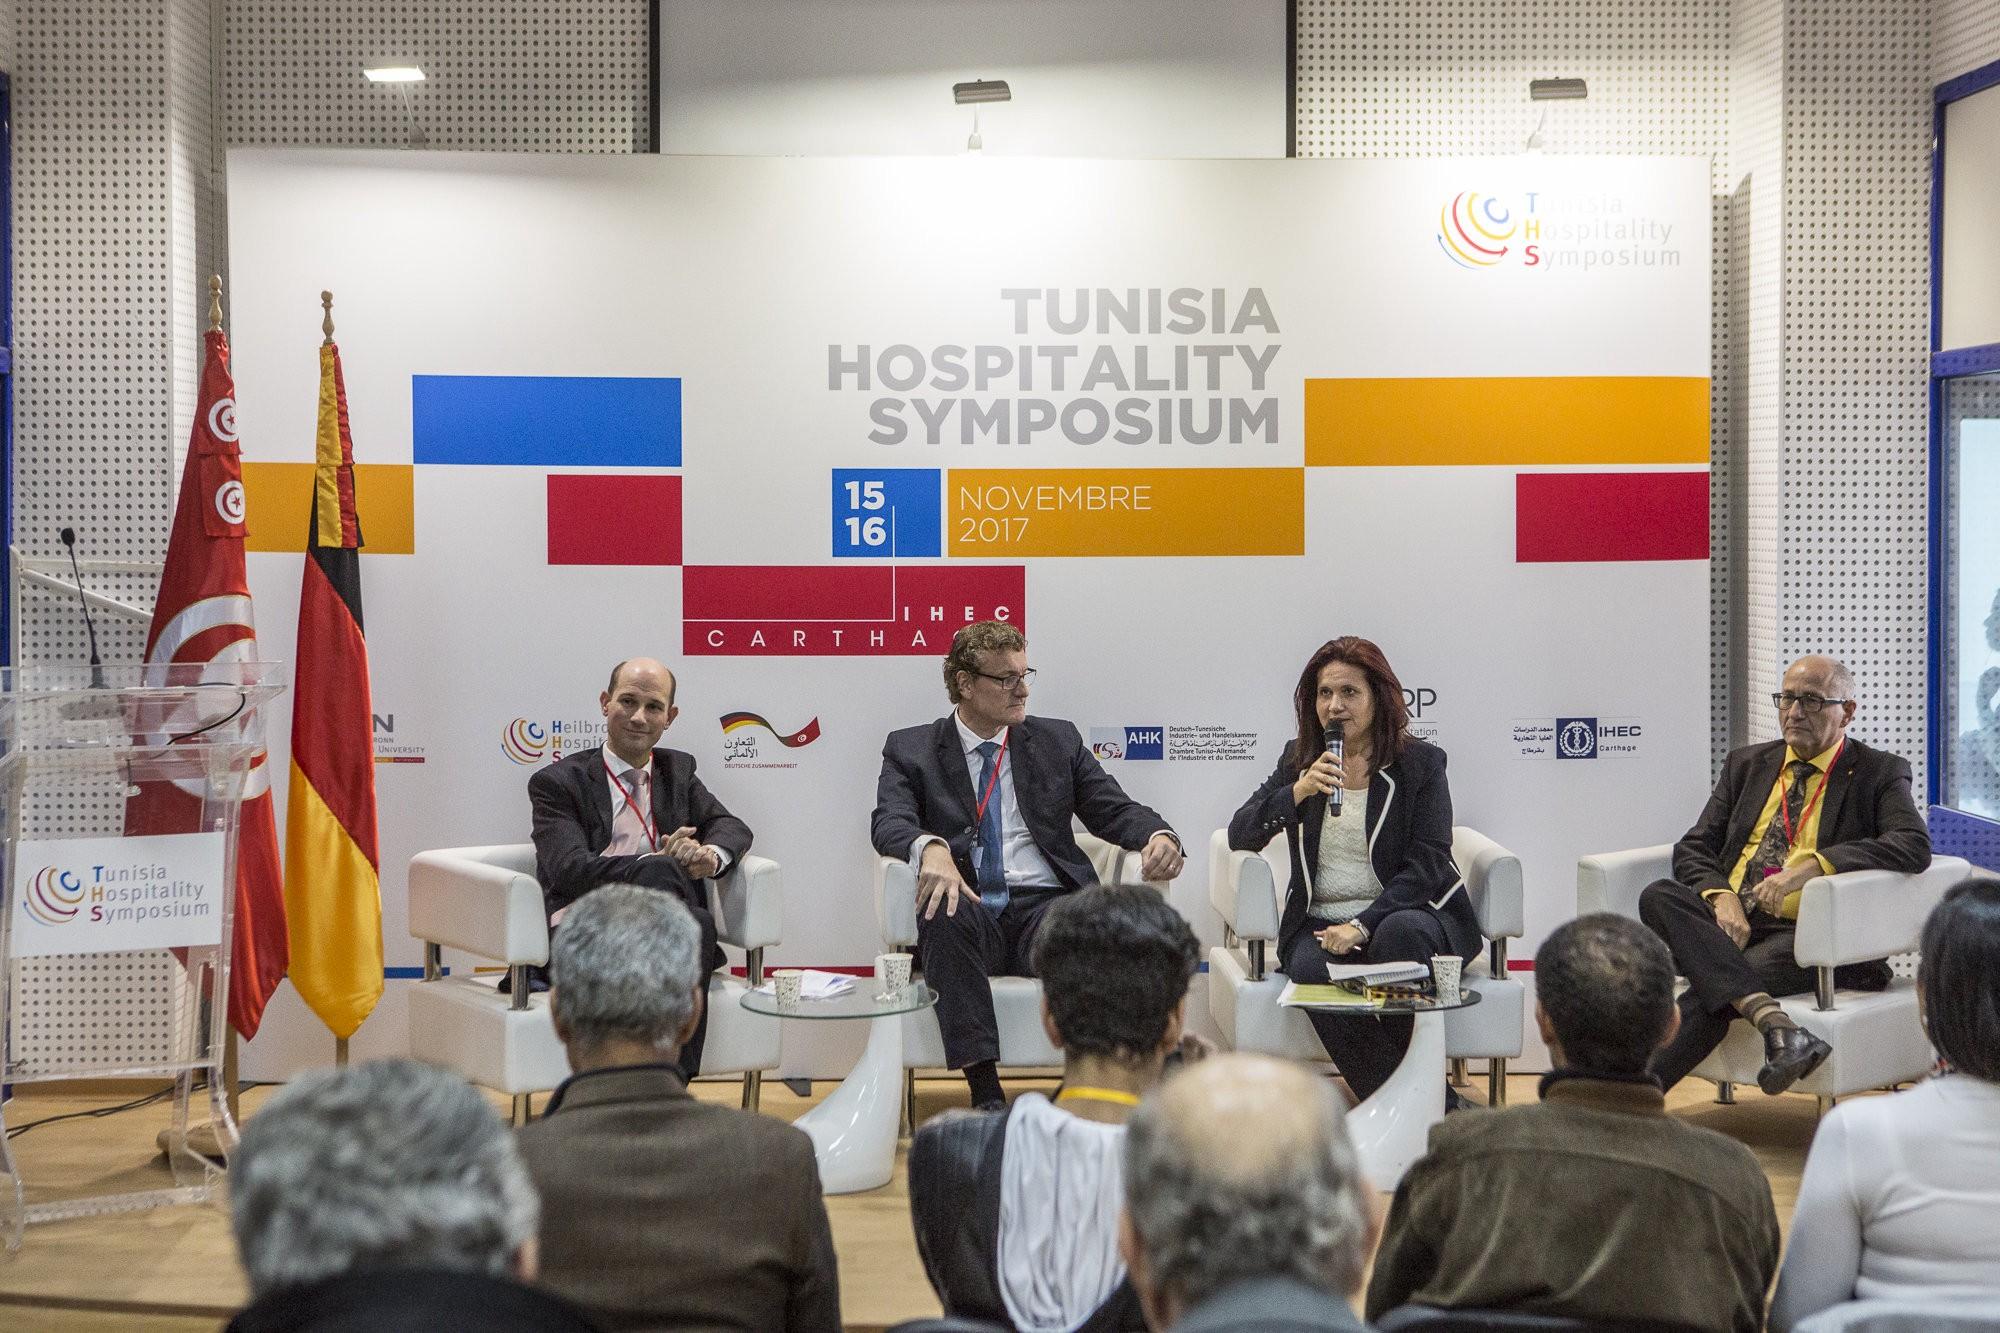 Tunisia Hospitality Symposium – Job2Future